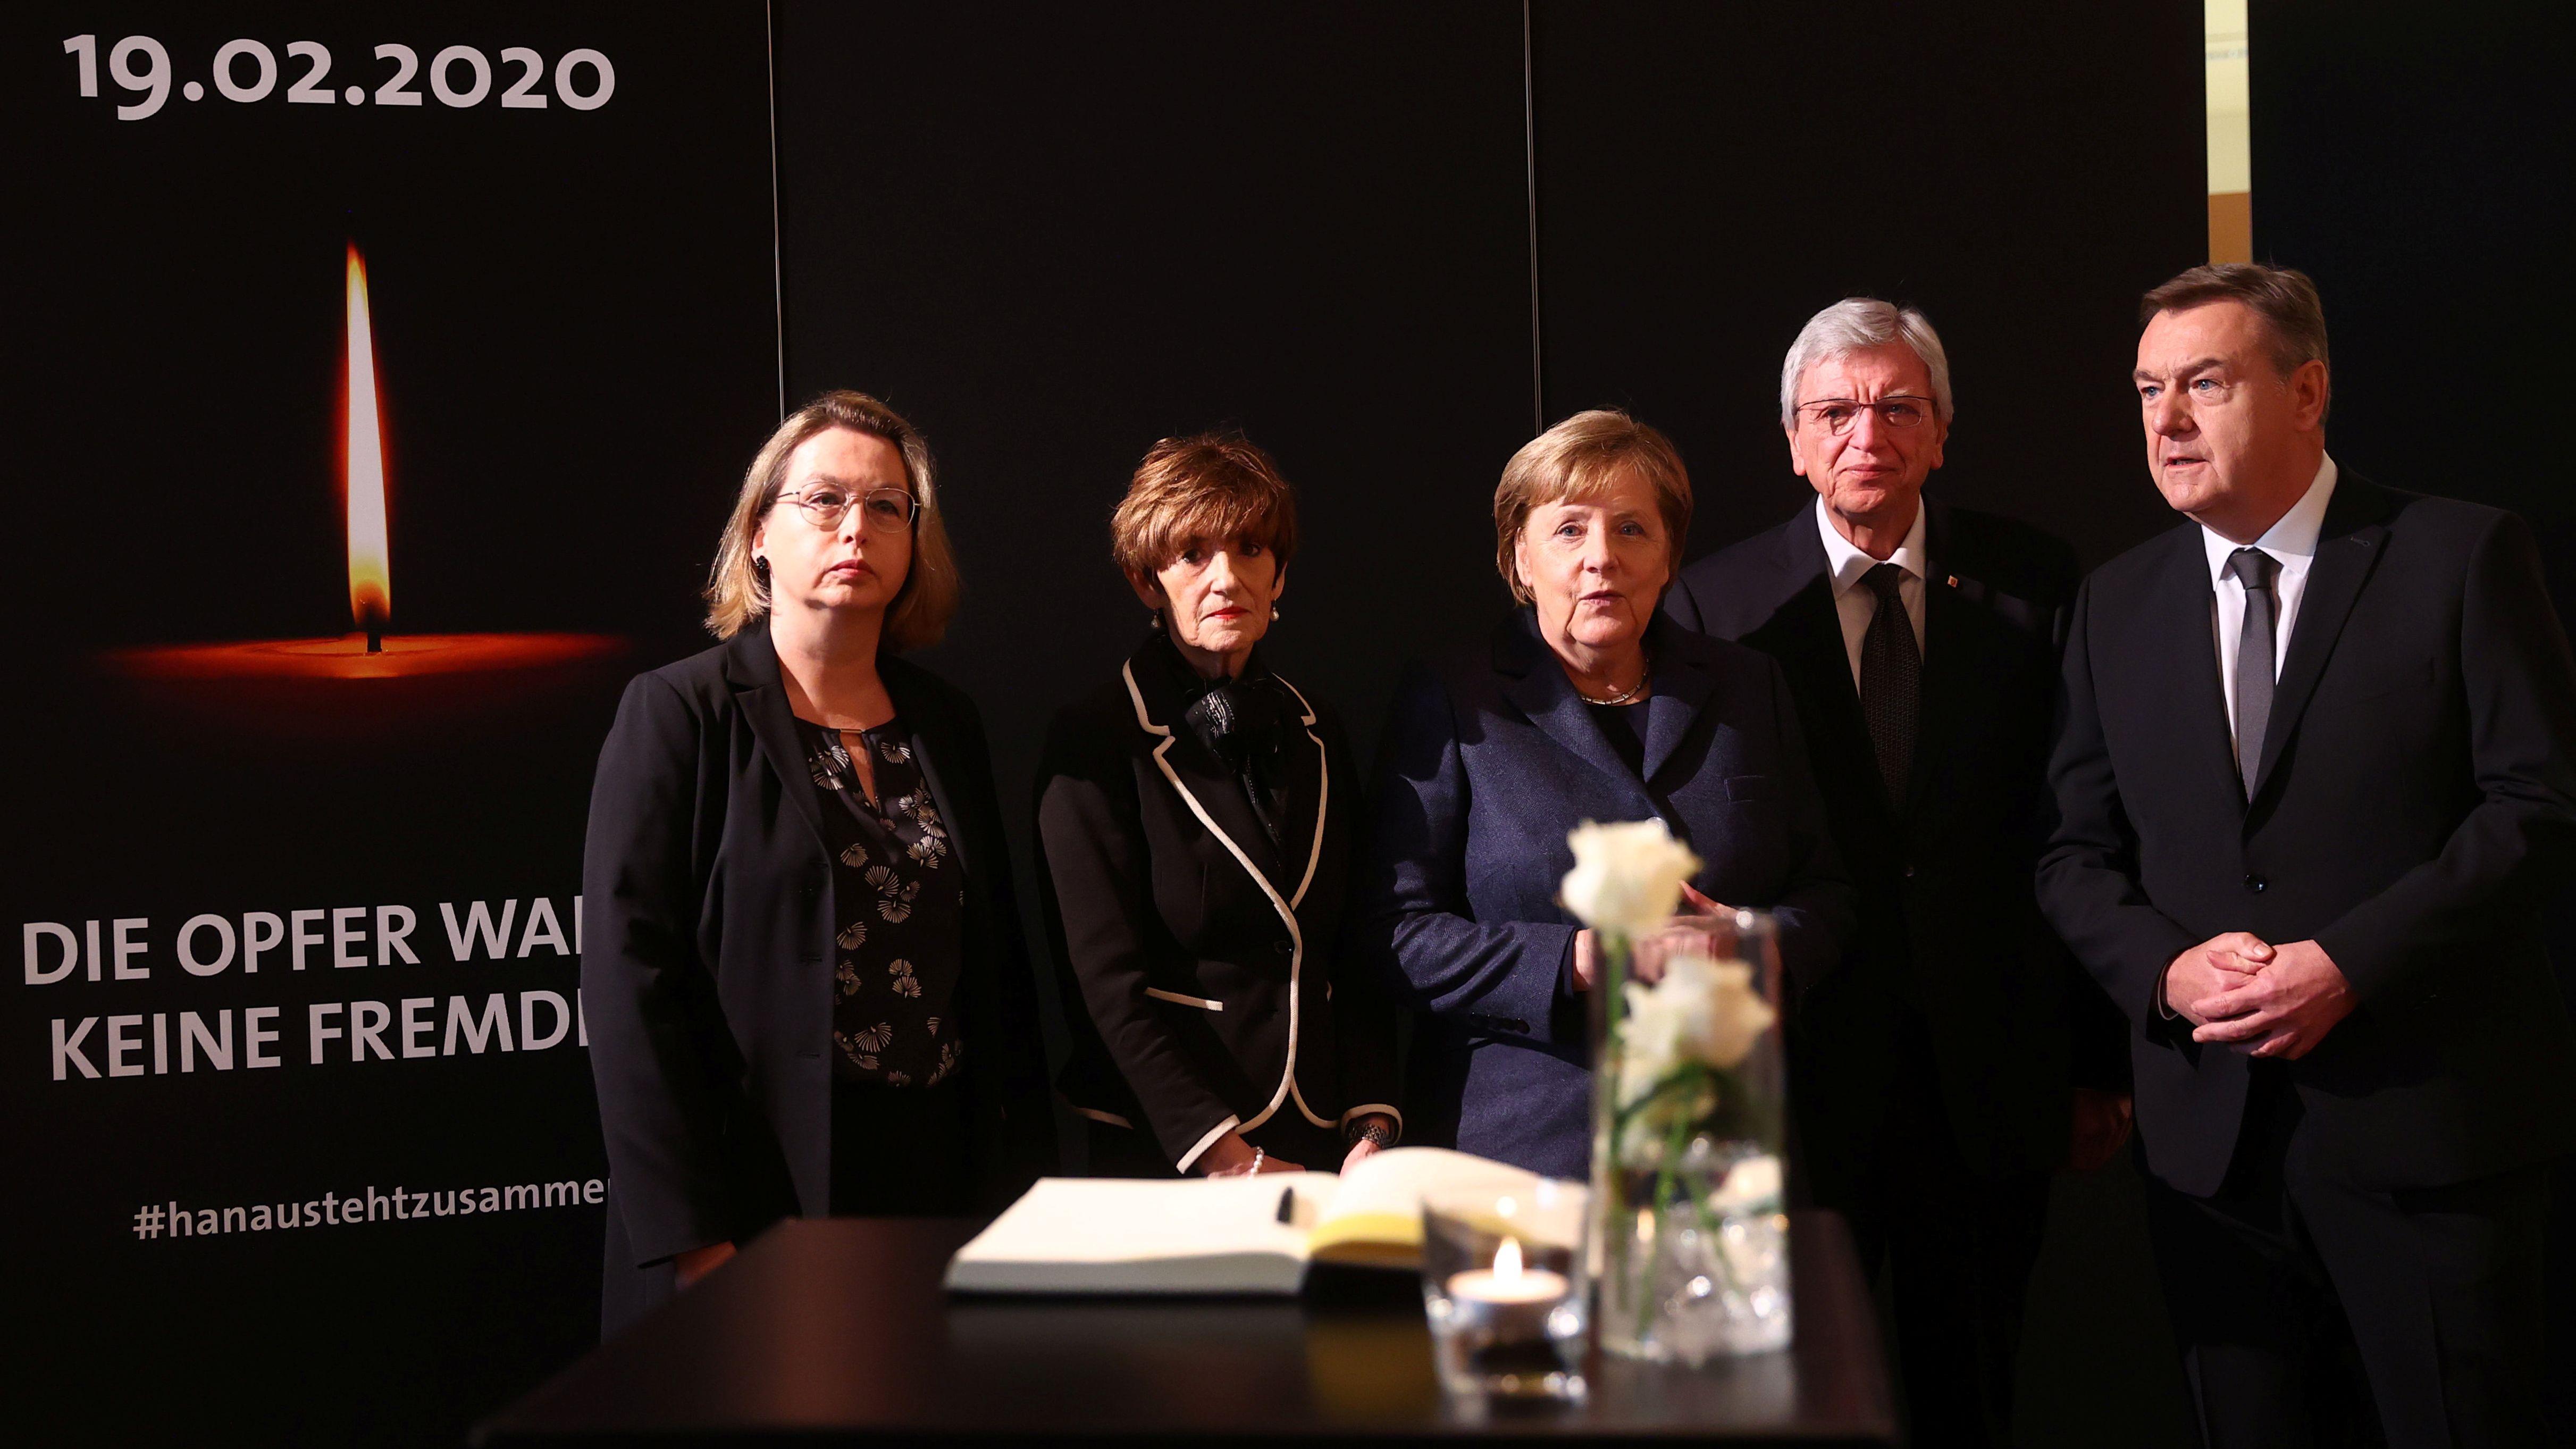 Ministerpräsident Volker Bouffier (CDU, 2.v.r), seine Frau Ursul (2.v.l), OB Claus Kaminsky (r), seine Frau (l), Bundeskanzlerin Merkel (CDU).